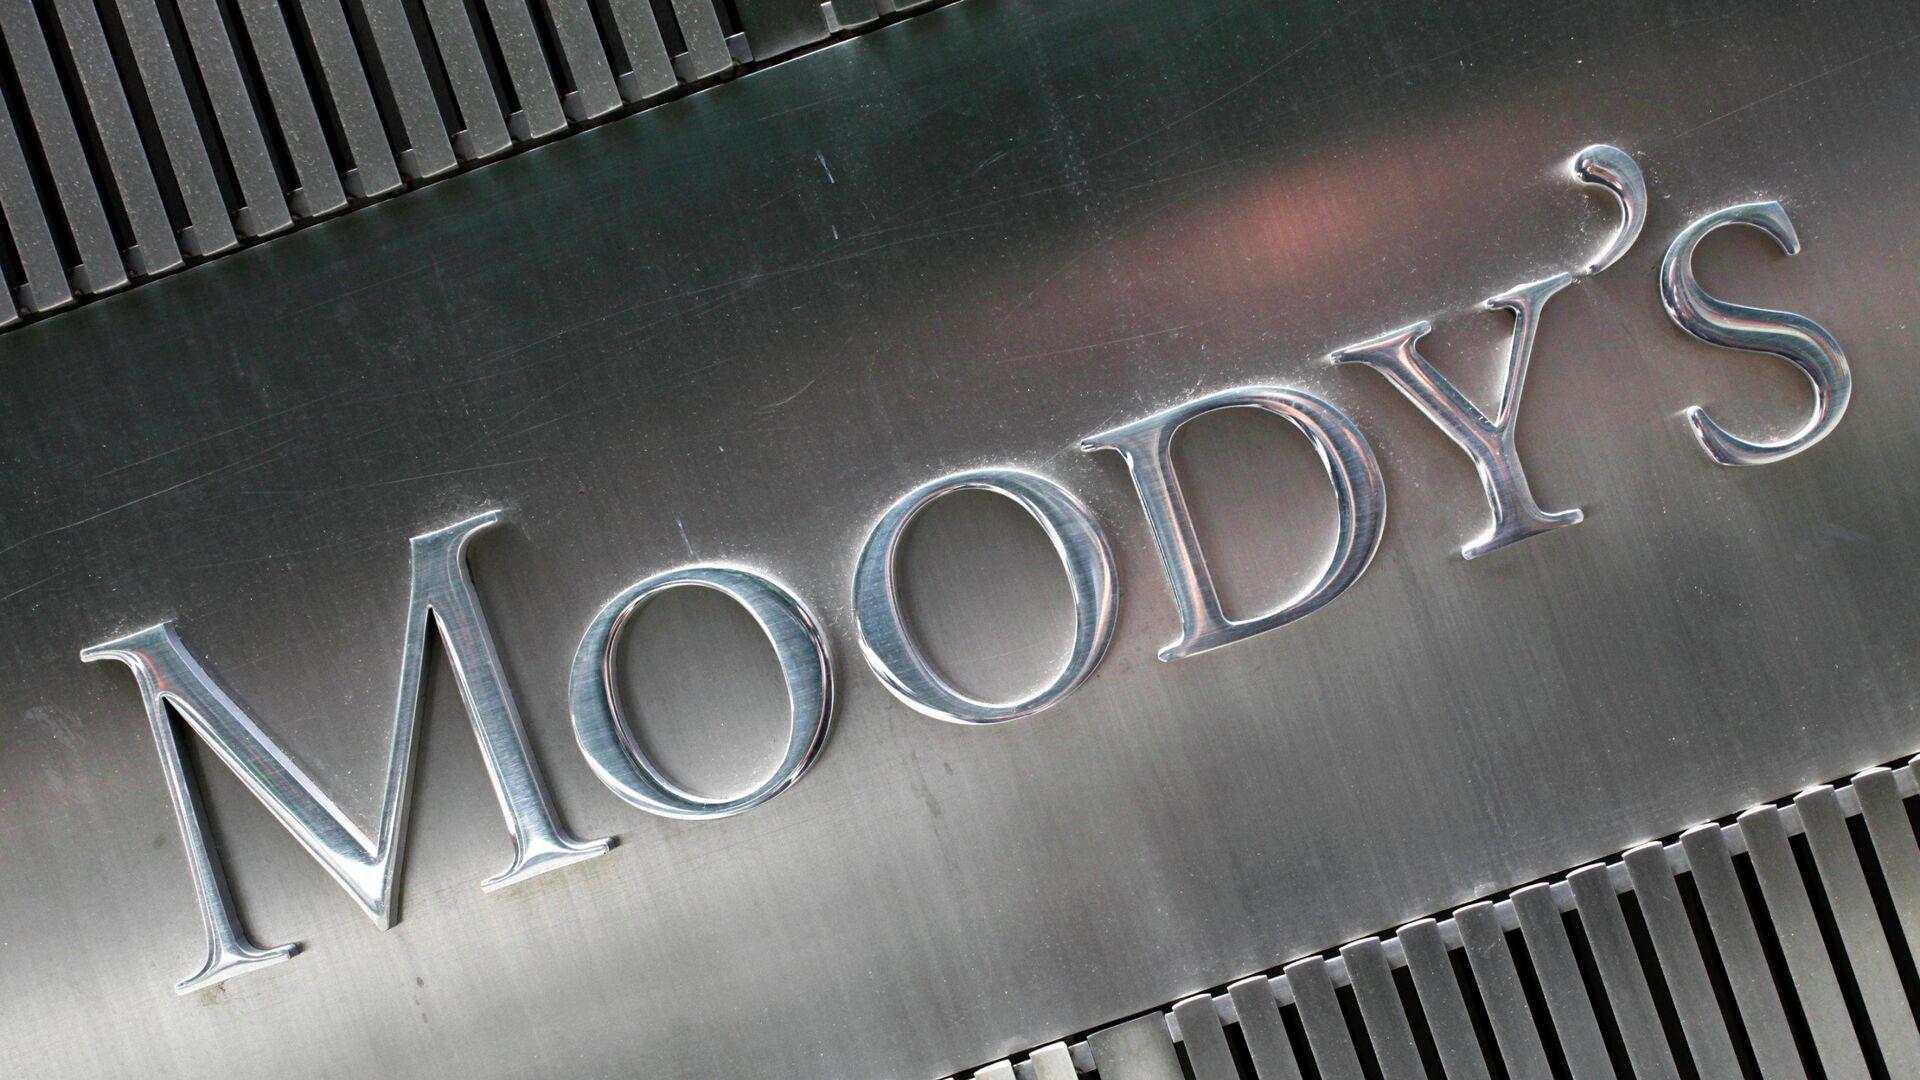 Agenzia di rating Moody's - Sputnik Italia, 1920, 21.09.2021